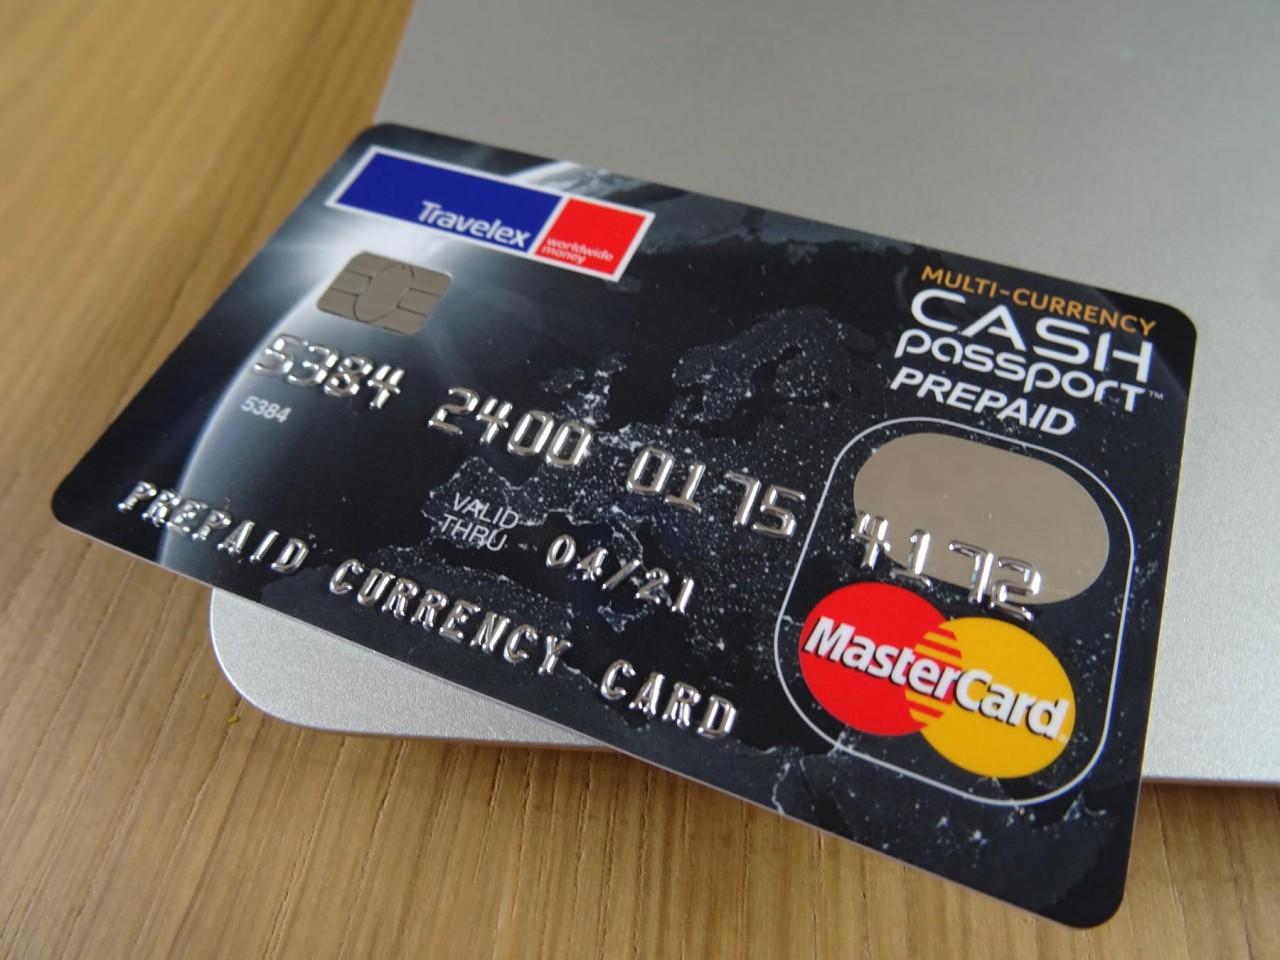 Travelex Multi Currency Cash Passport DUBAI is it any good?